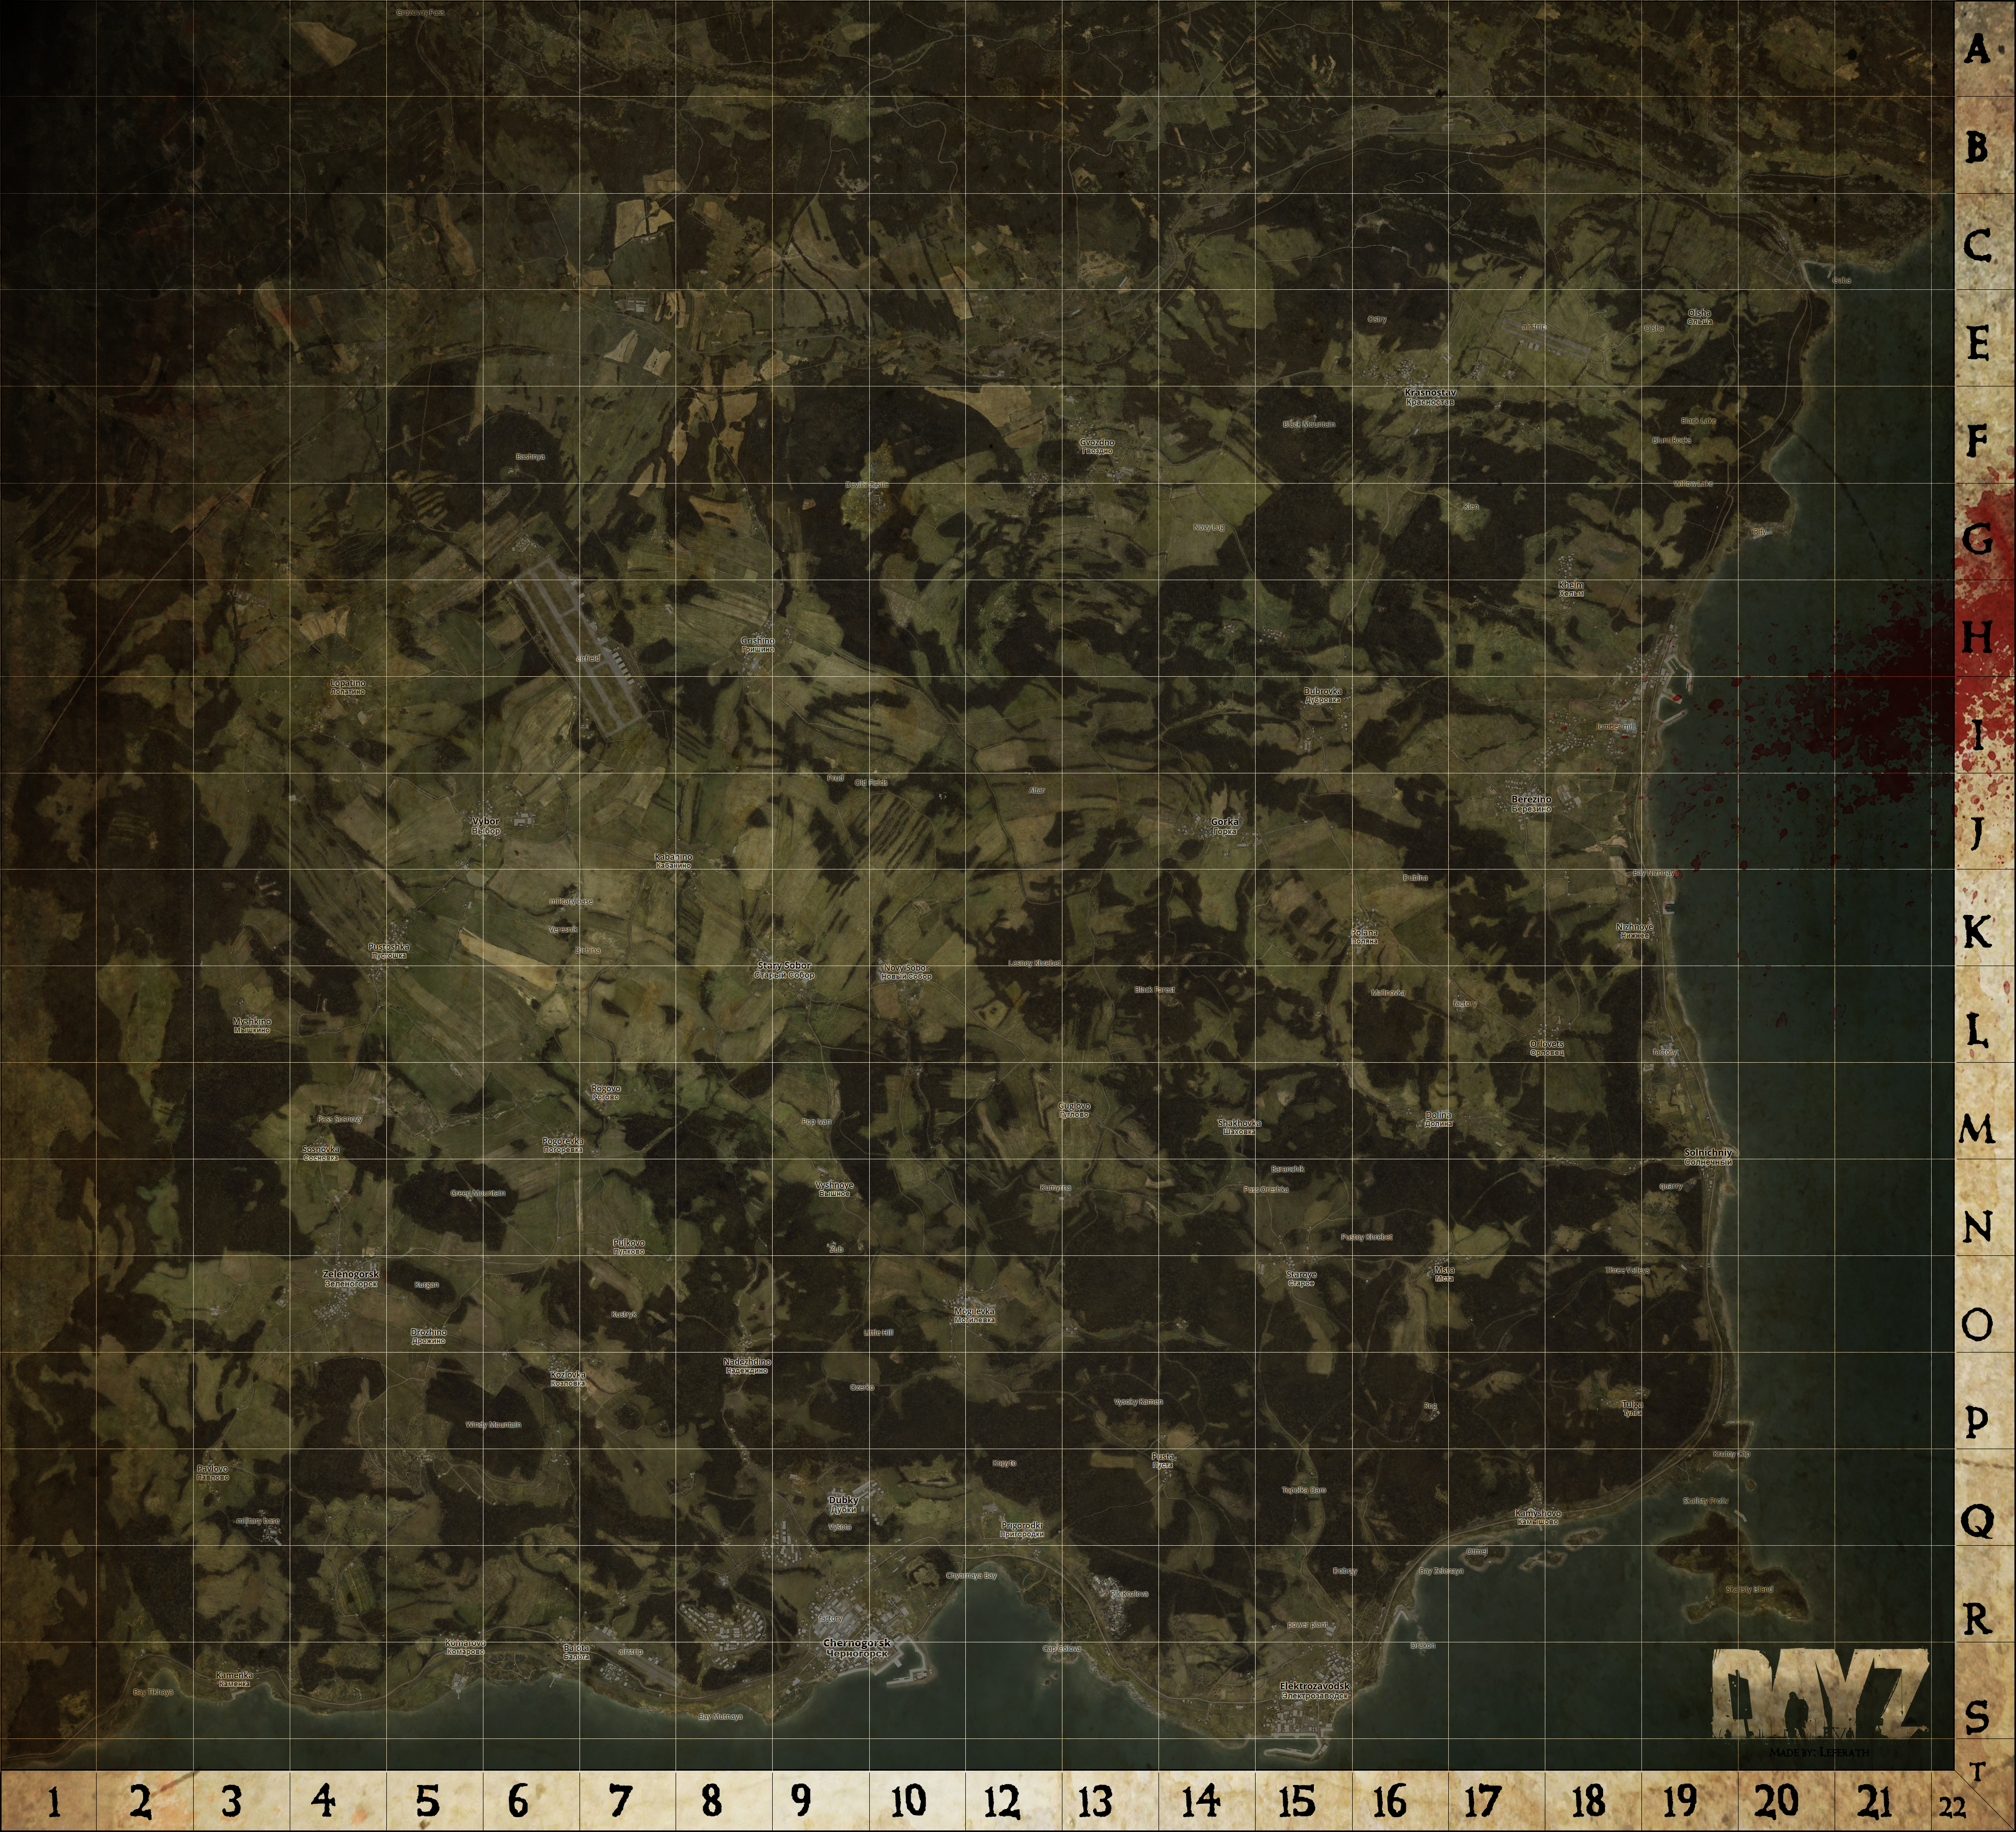 Dayz standalone оружие - 90c56